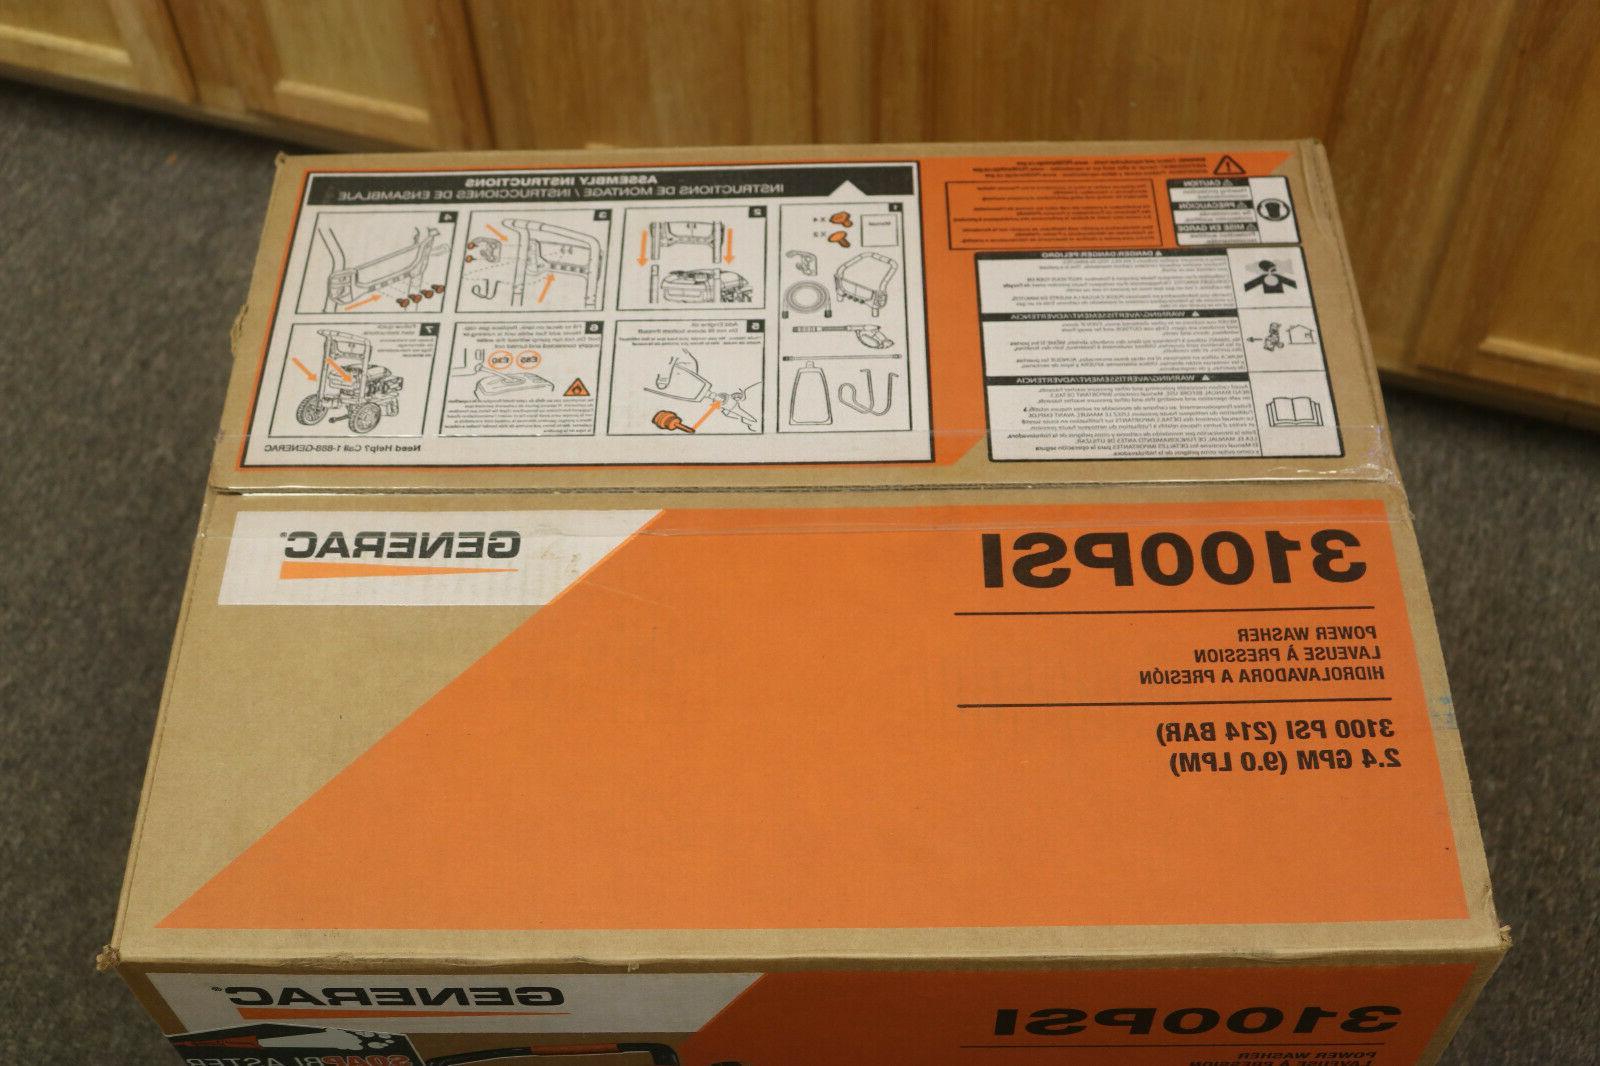 Generac G0079010 3100 Gas Pressure Washer *NEW*